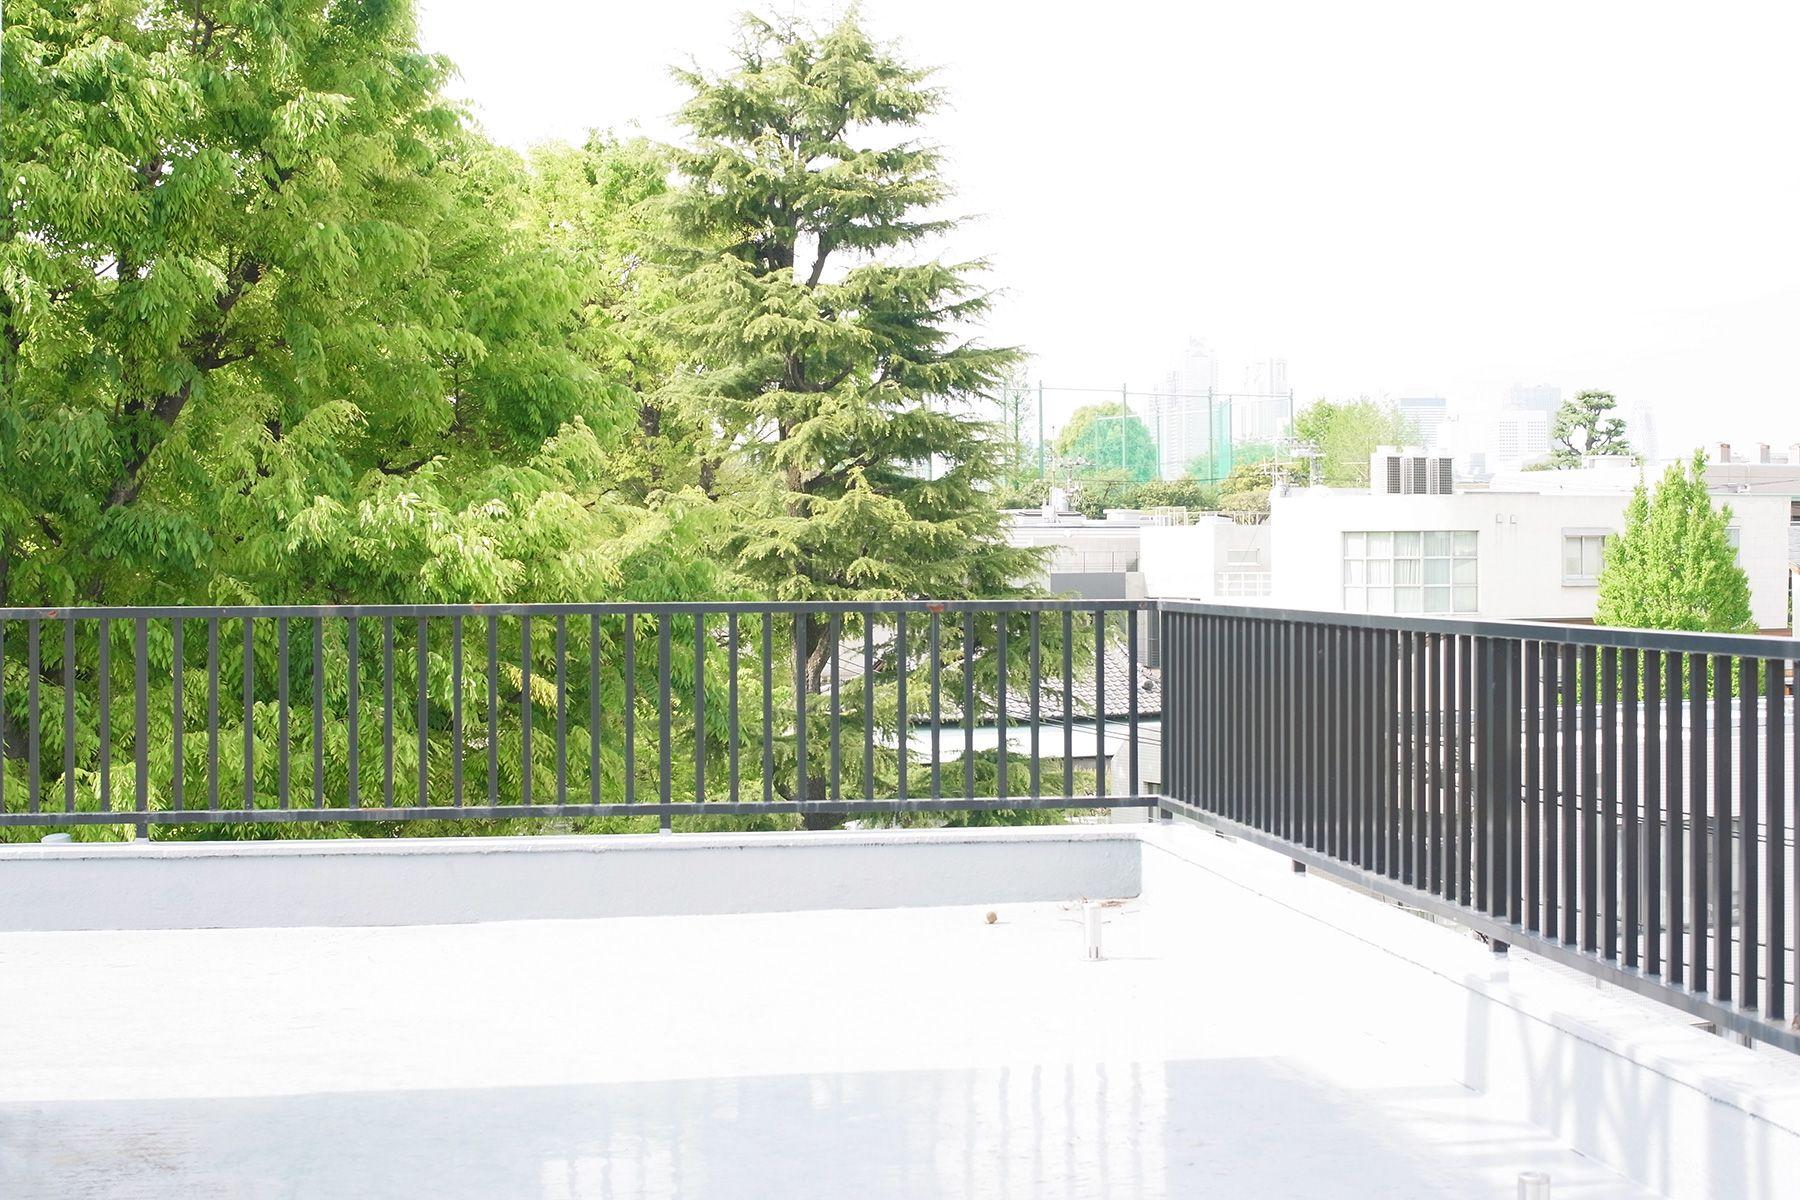 SHOTOHOUSE302 (ショウトウハウス302)屋上/公園の緑